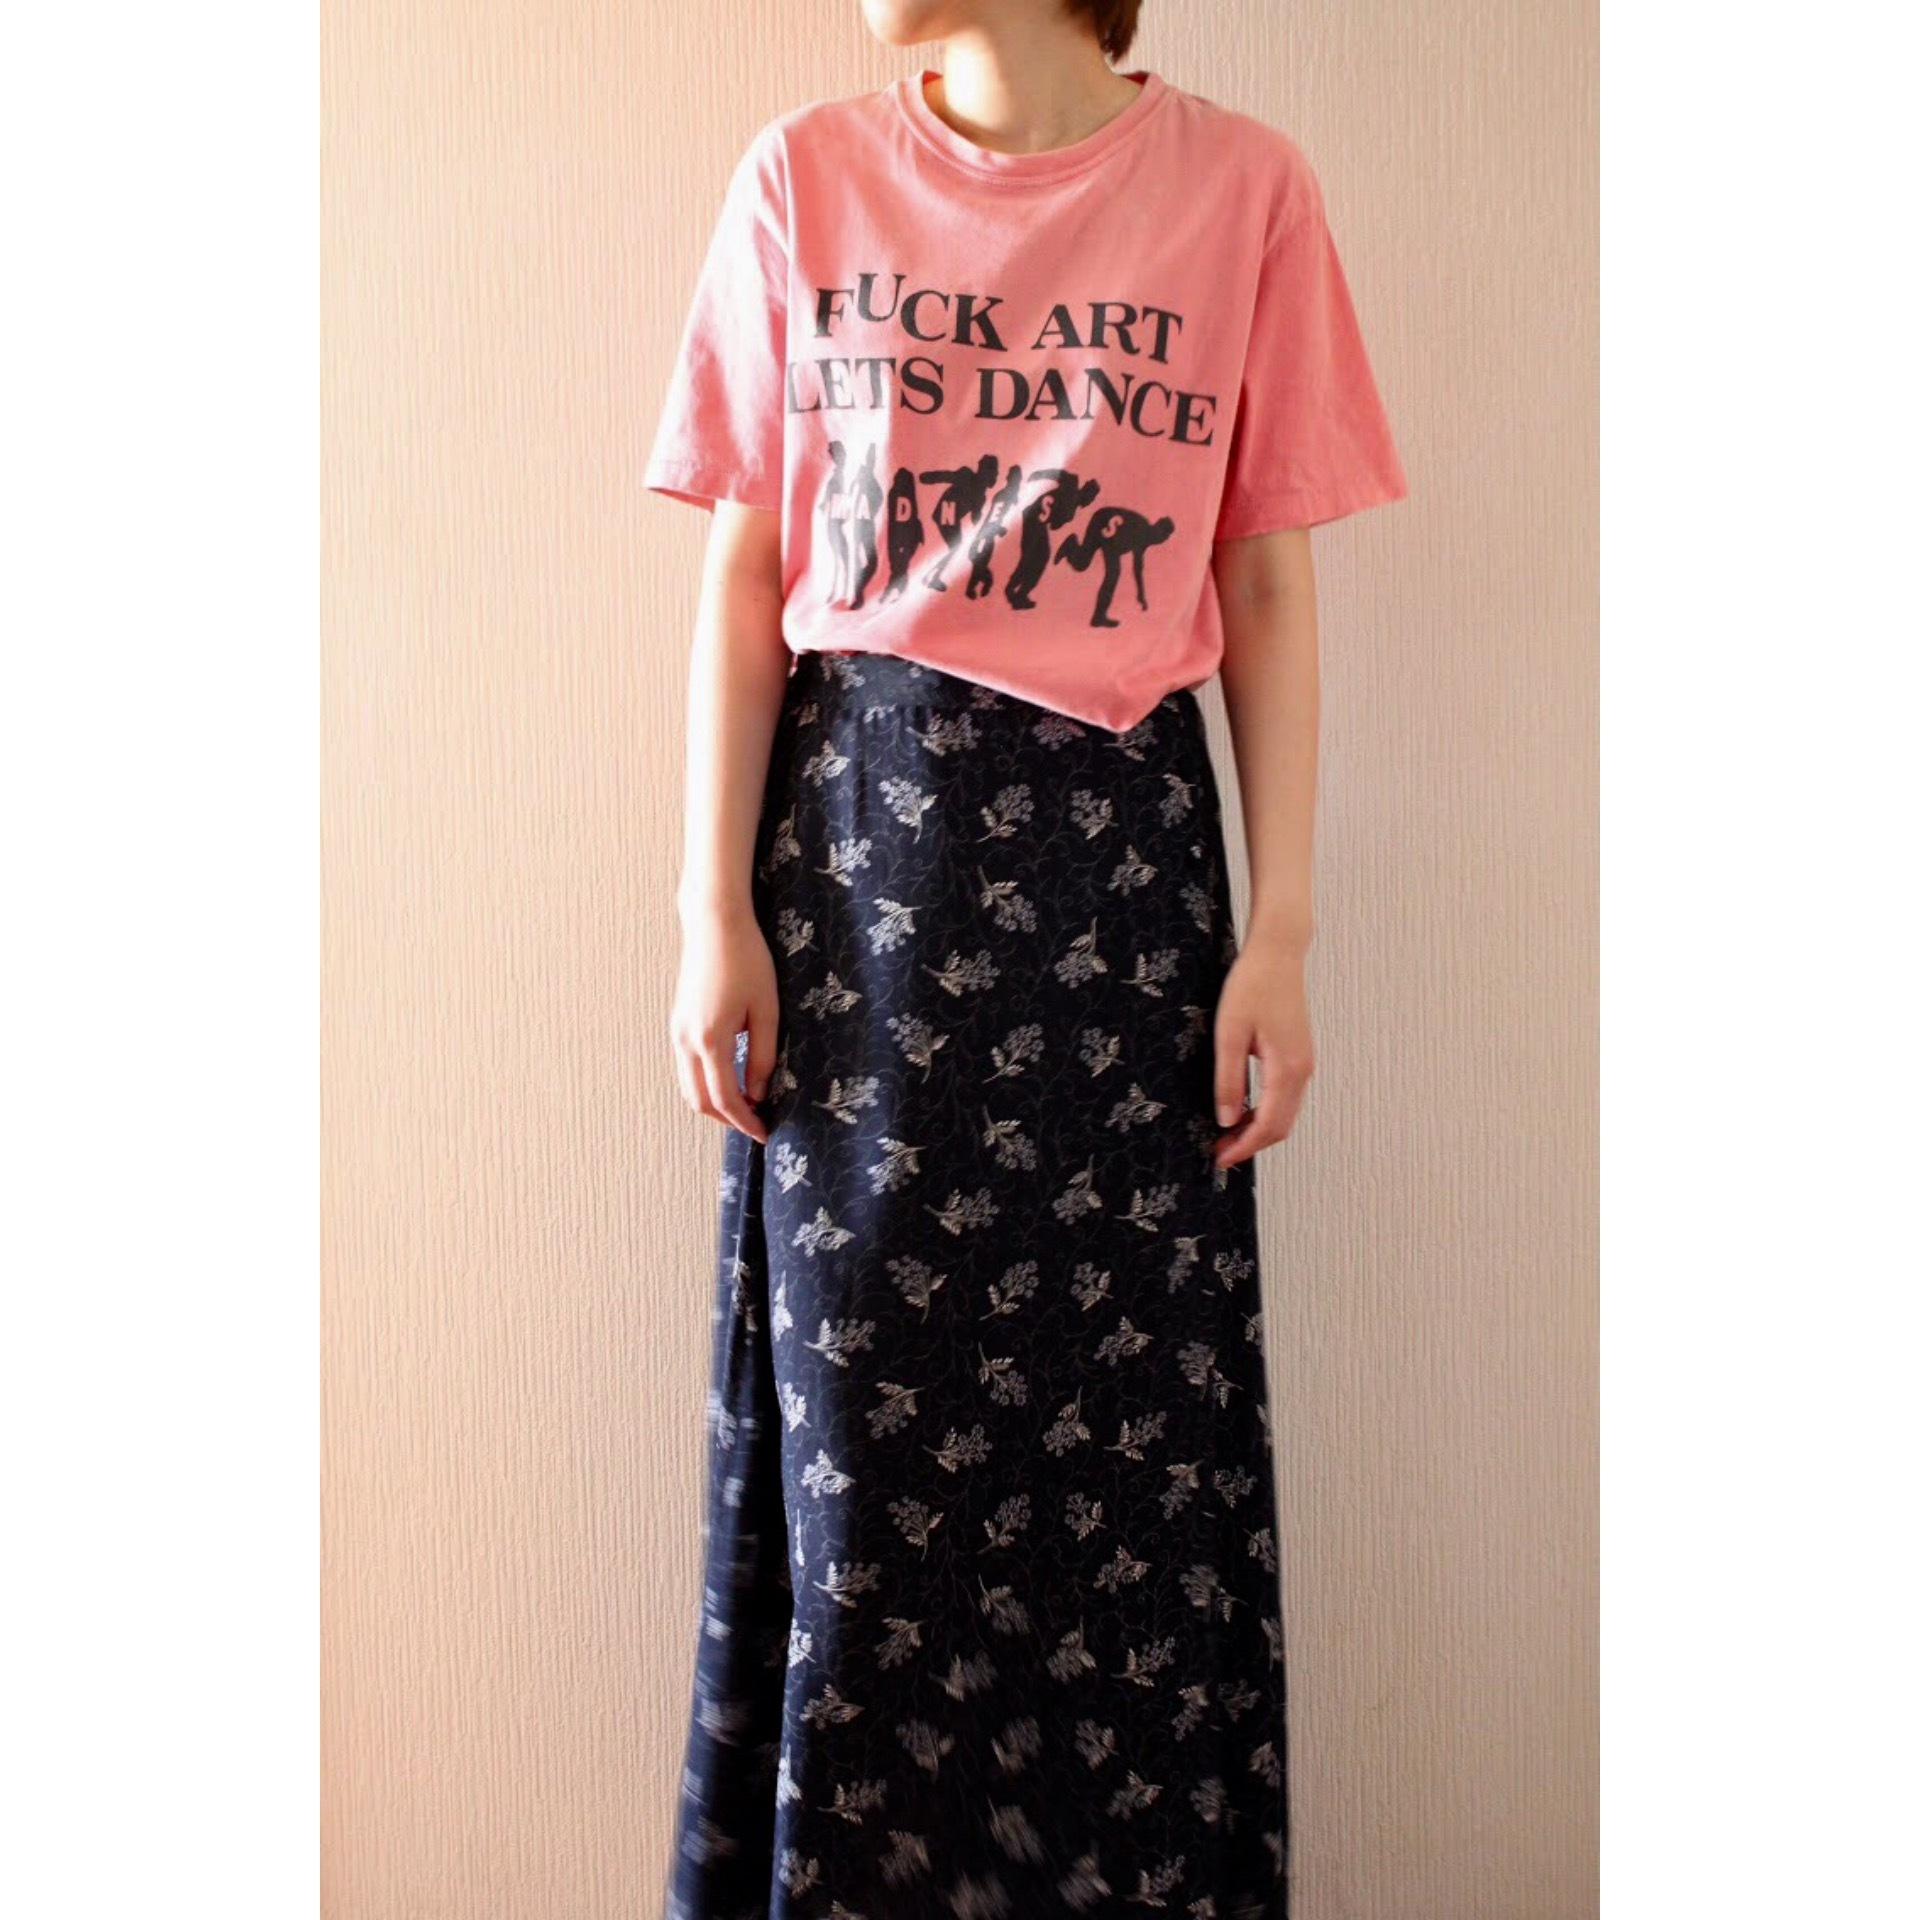 Vintage MADNESS t shirt